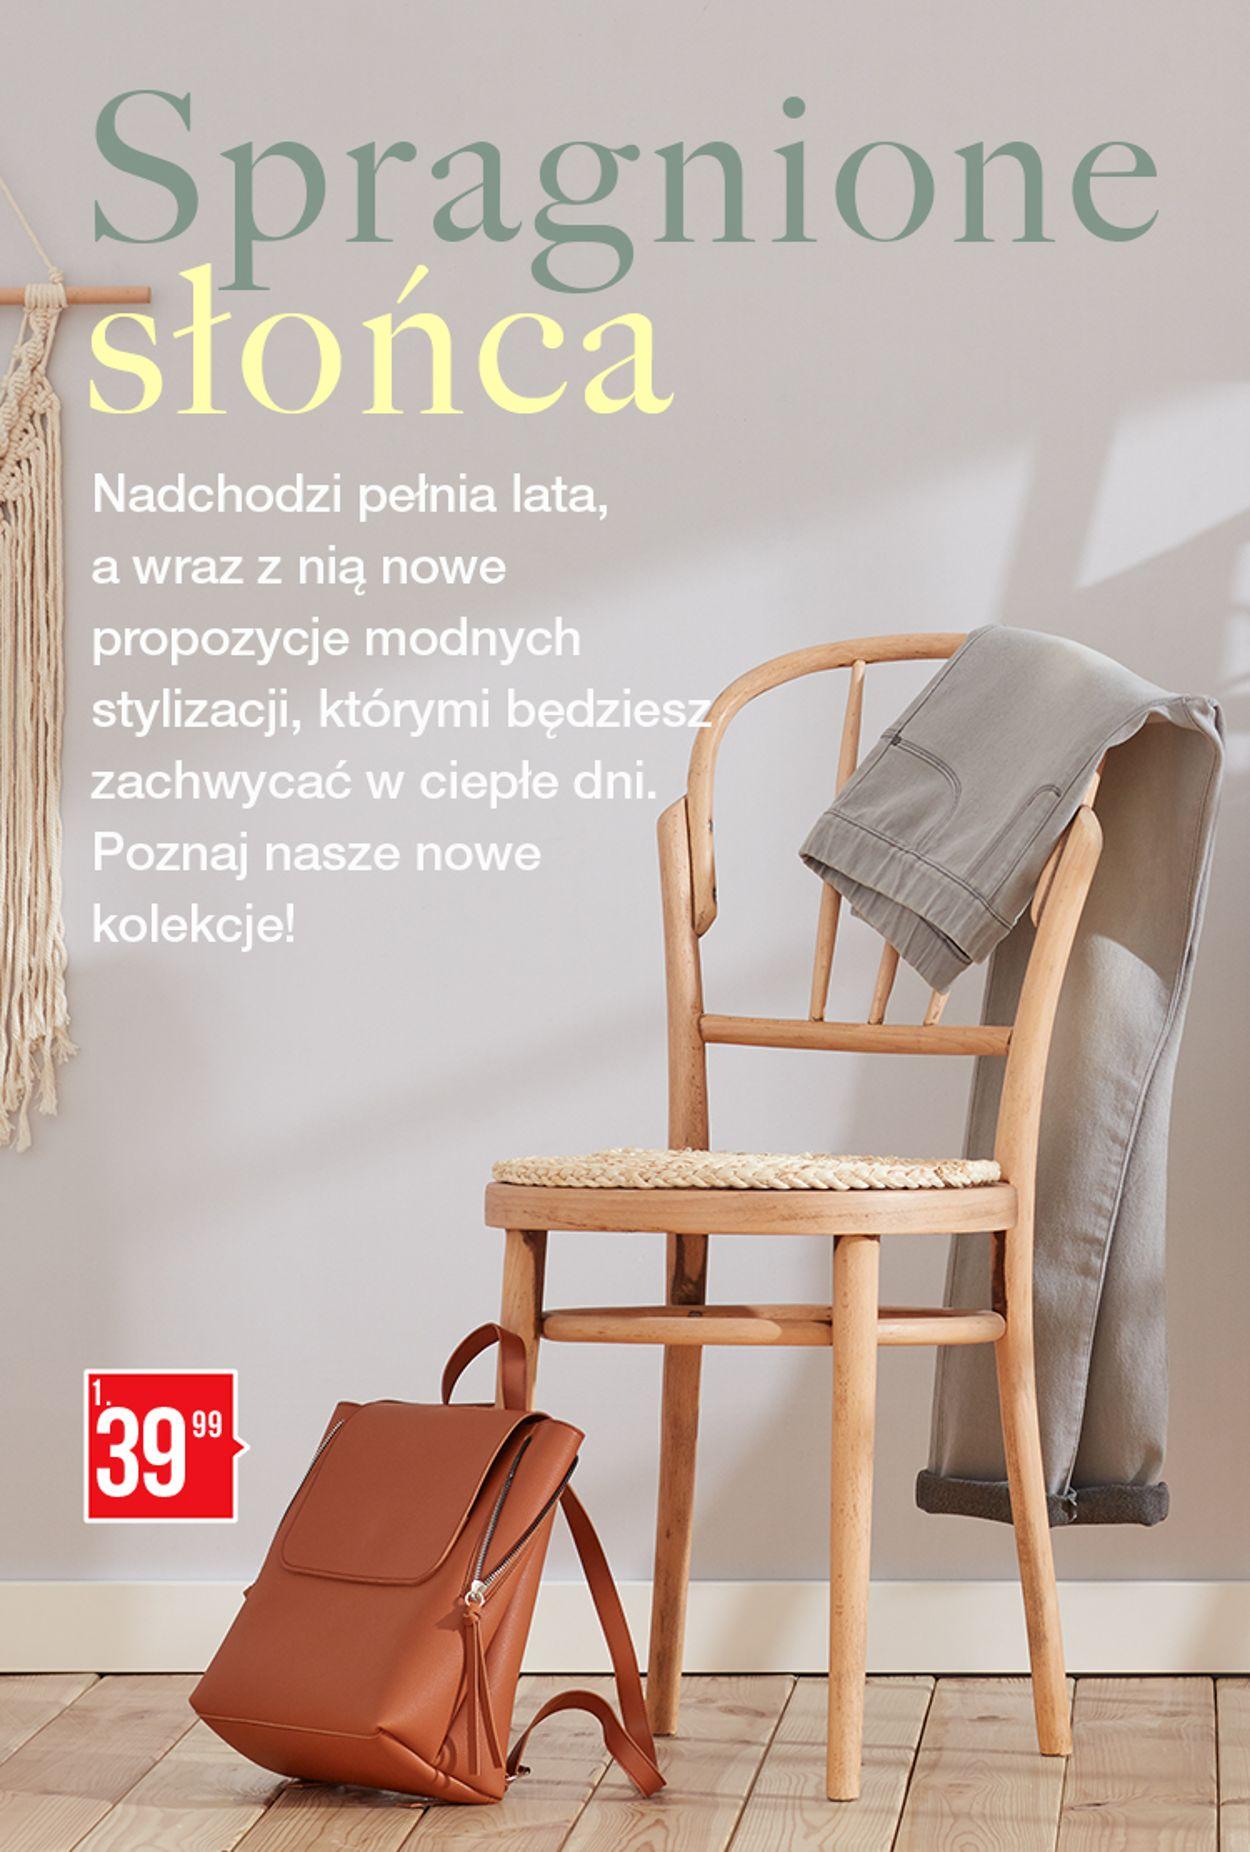 Gazetka promocyjna Pepco - 23.06-31.08.2020